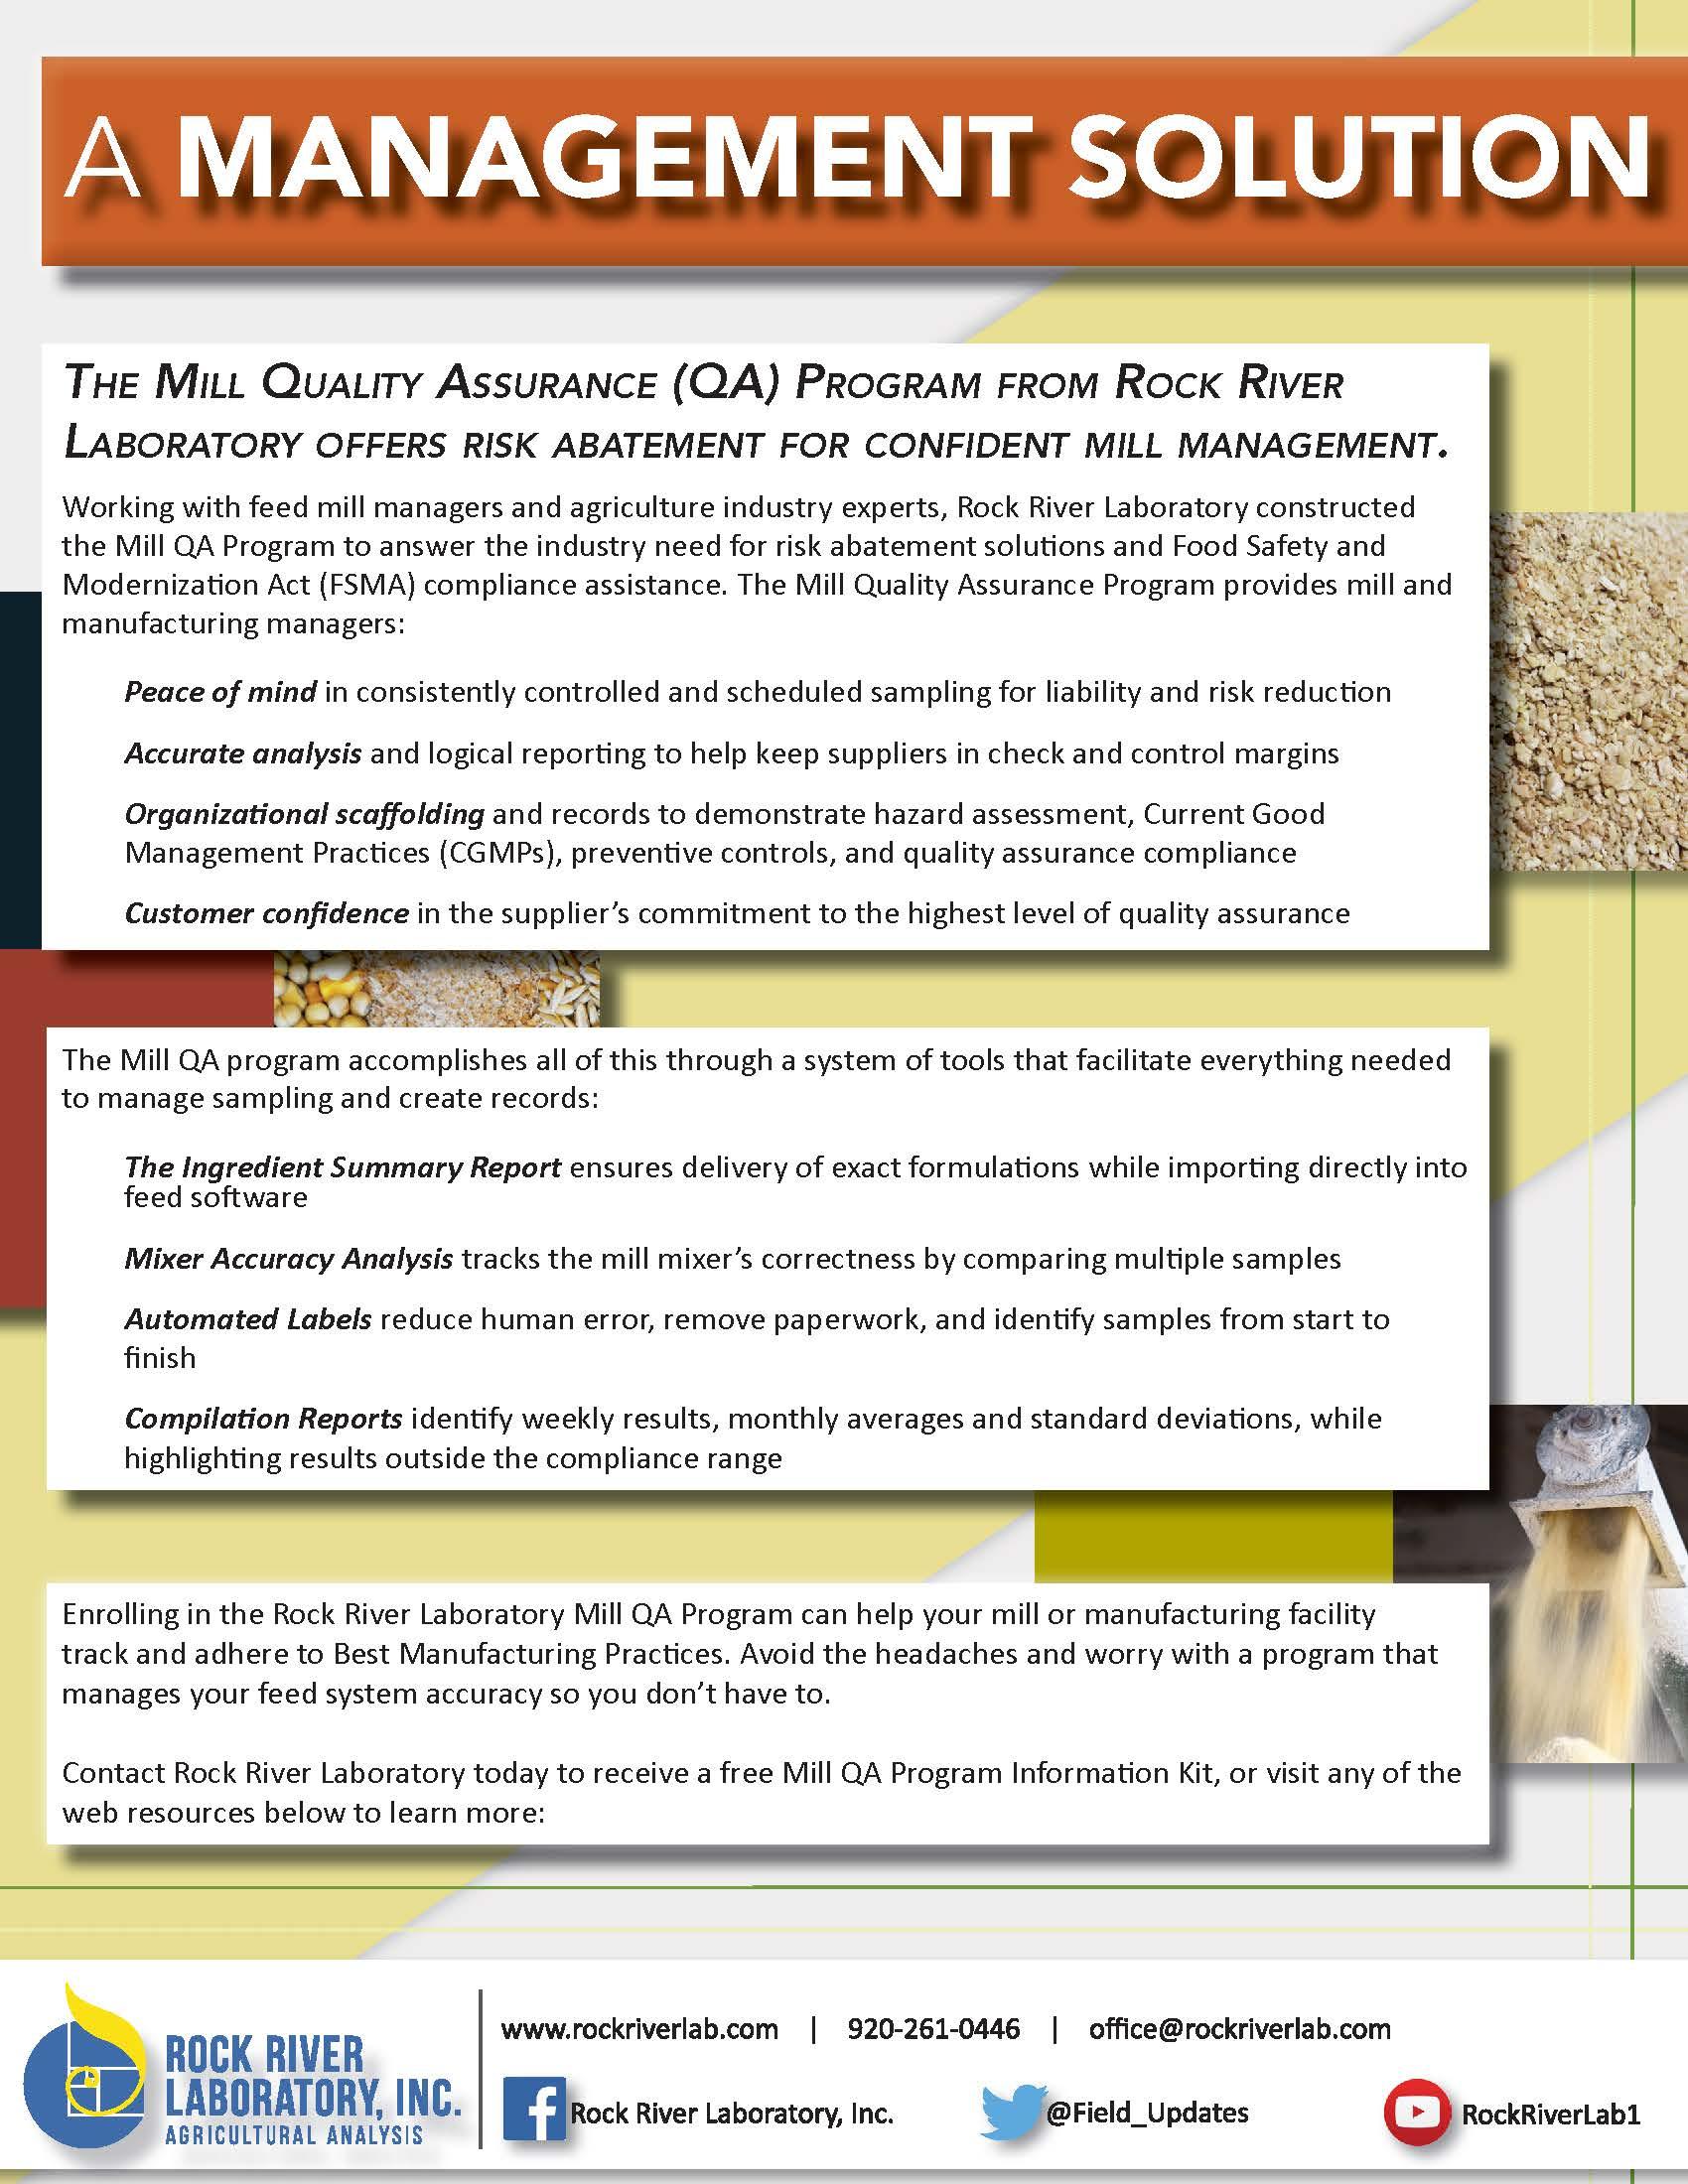 Mill Quality Assurance Program